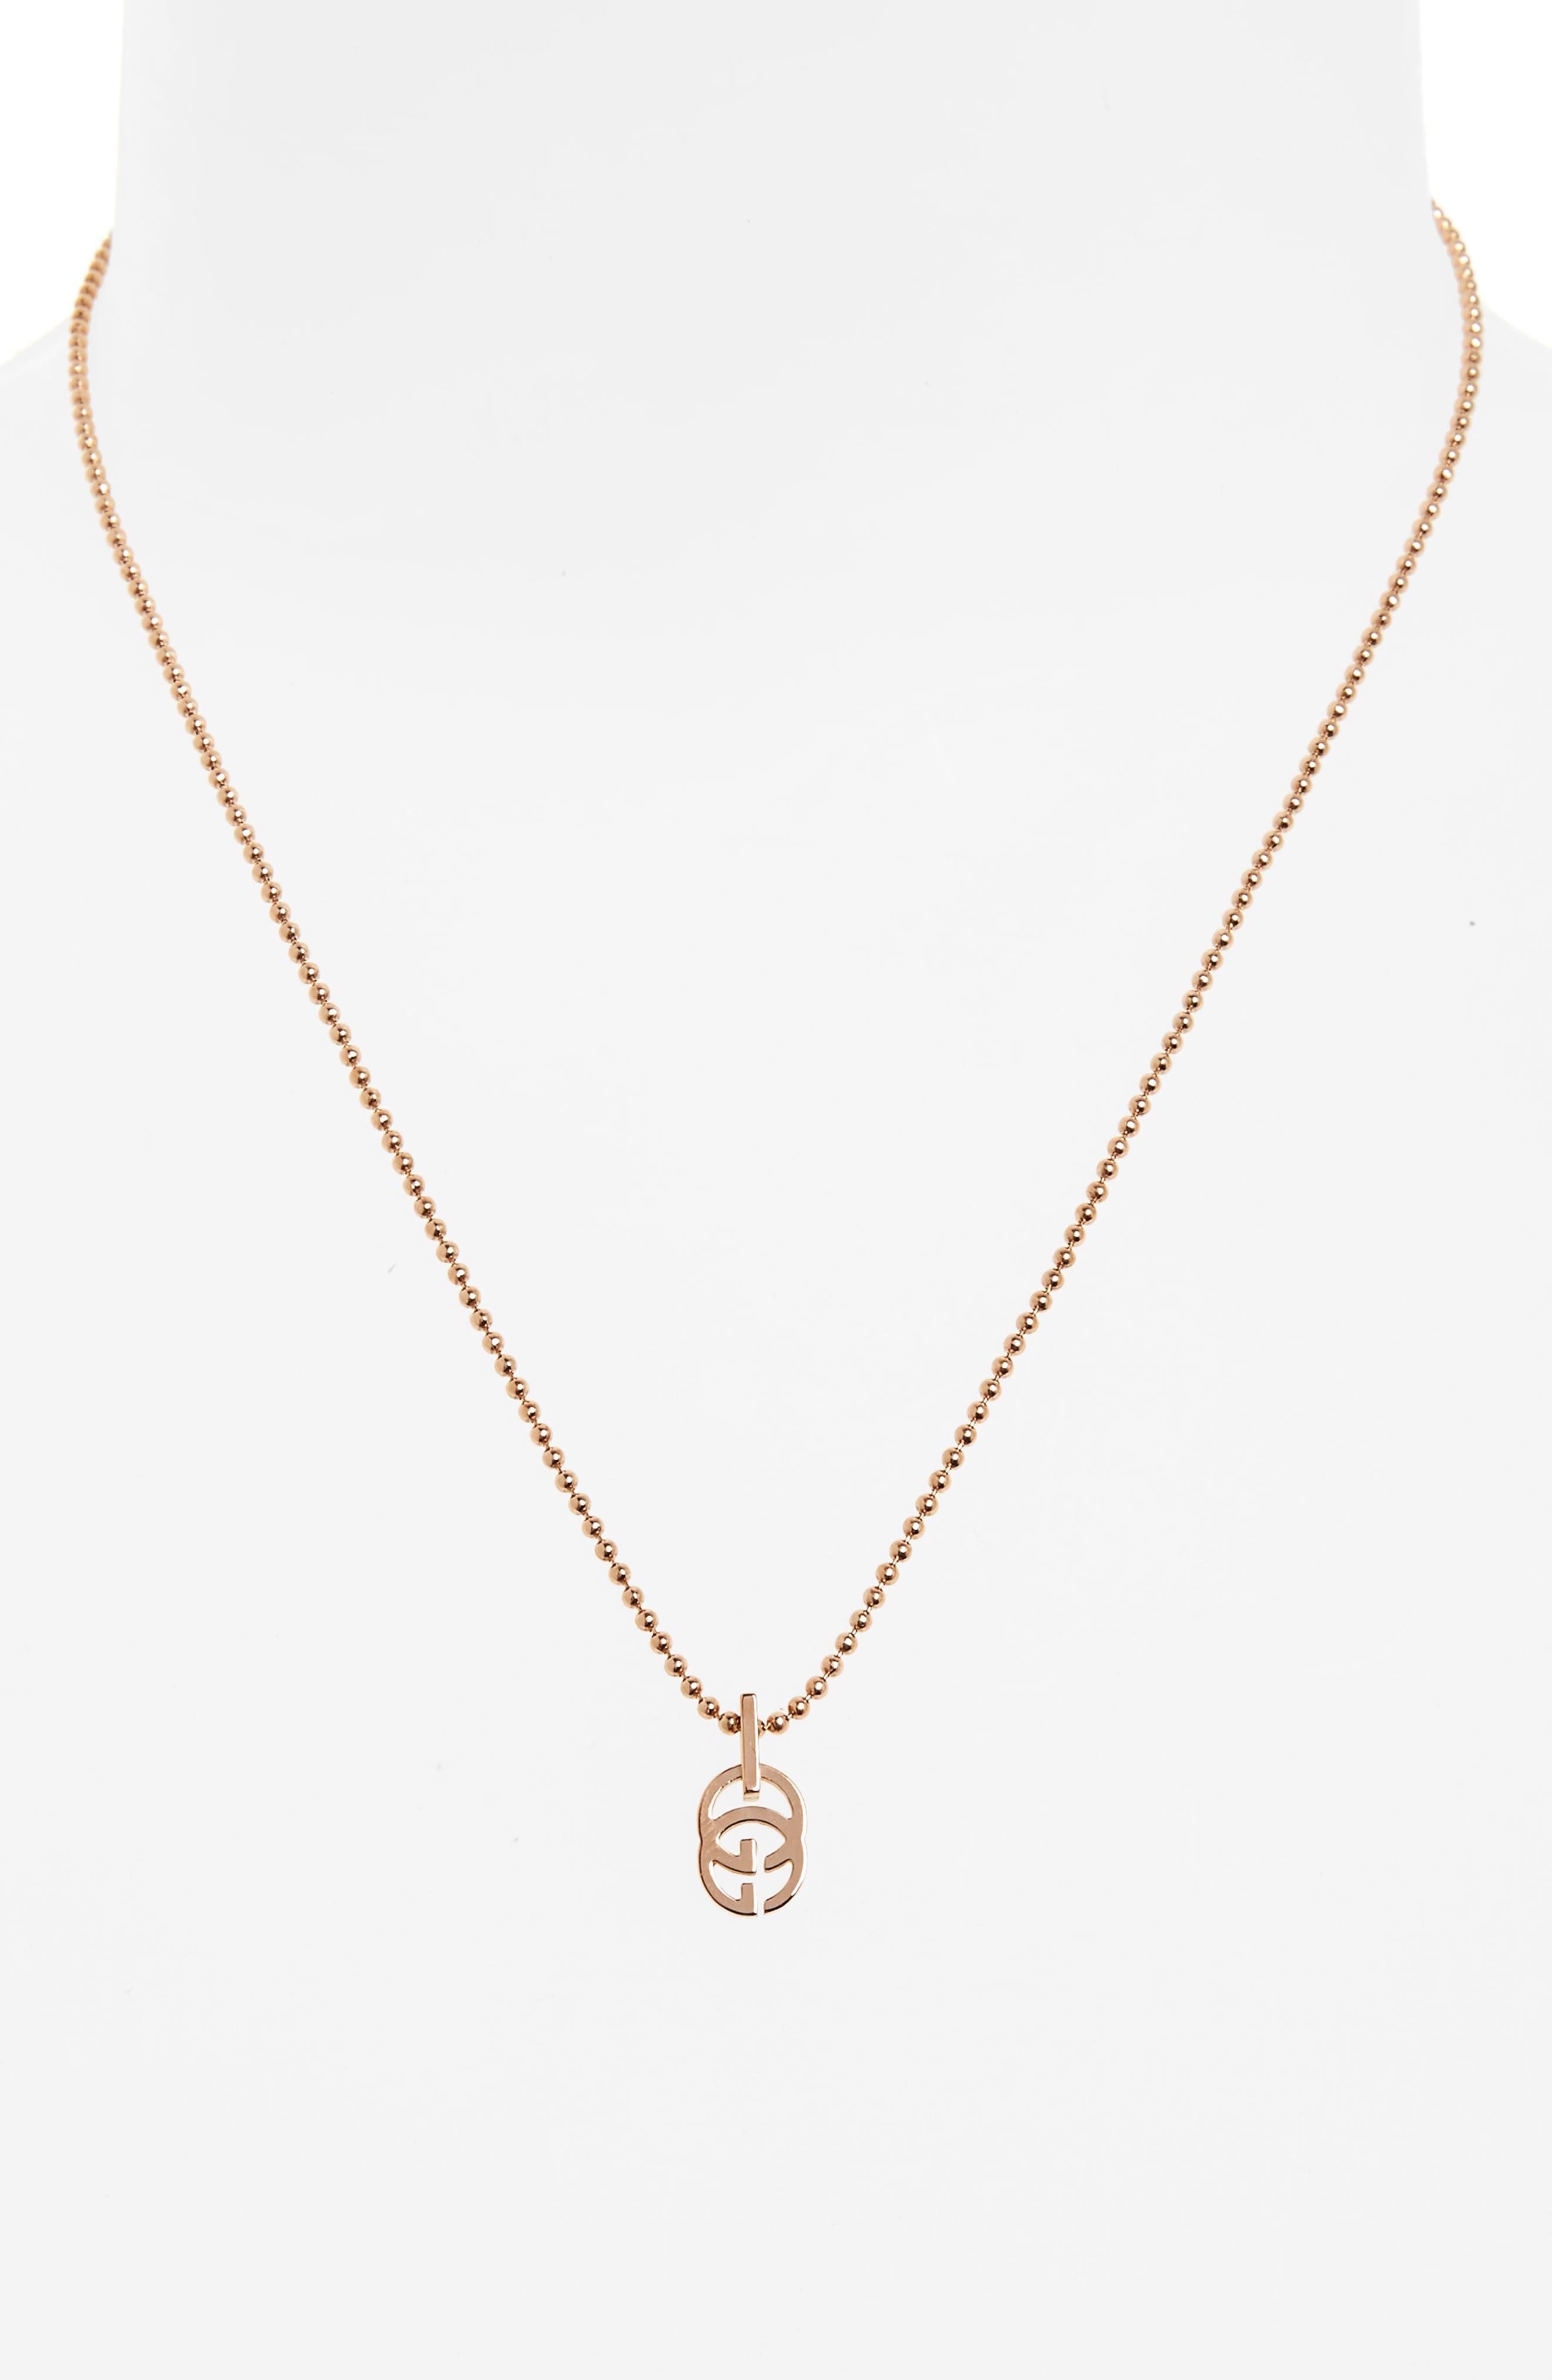 Double-G Pendant Necklace,                             Alternate thumbnail 2, color,                             ROSE GOLD